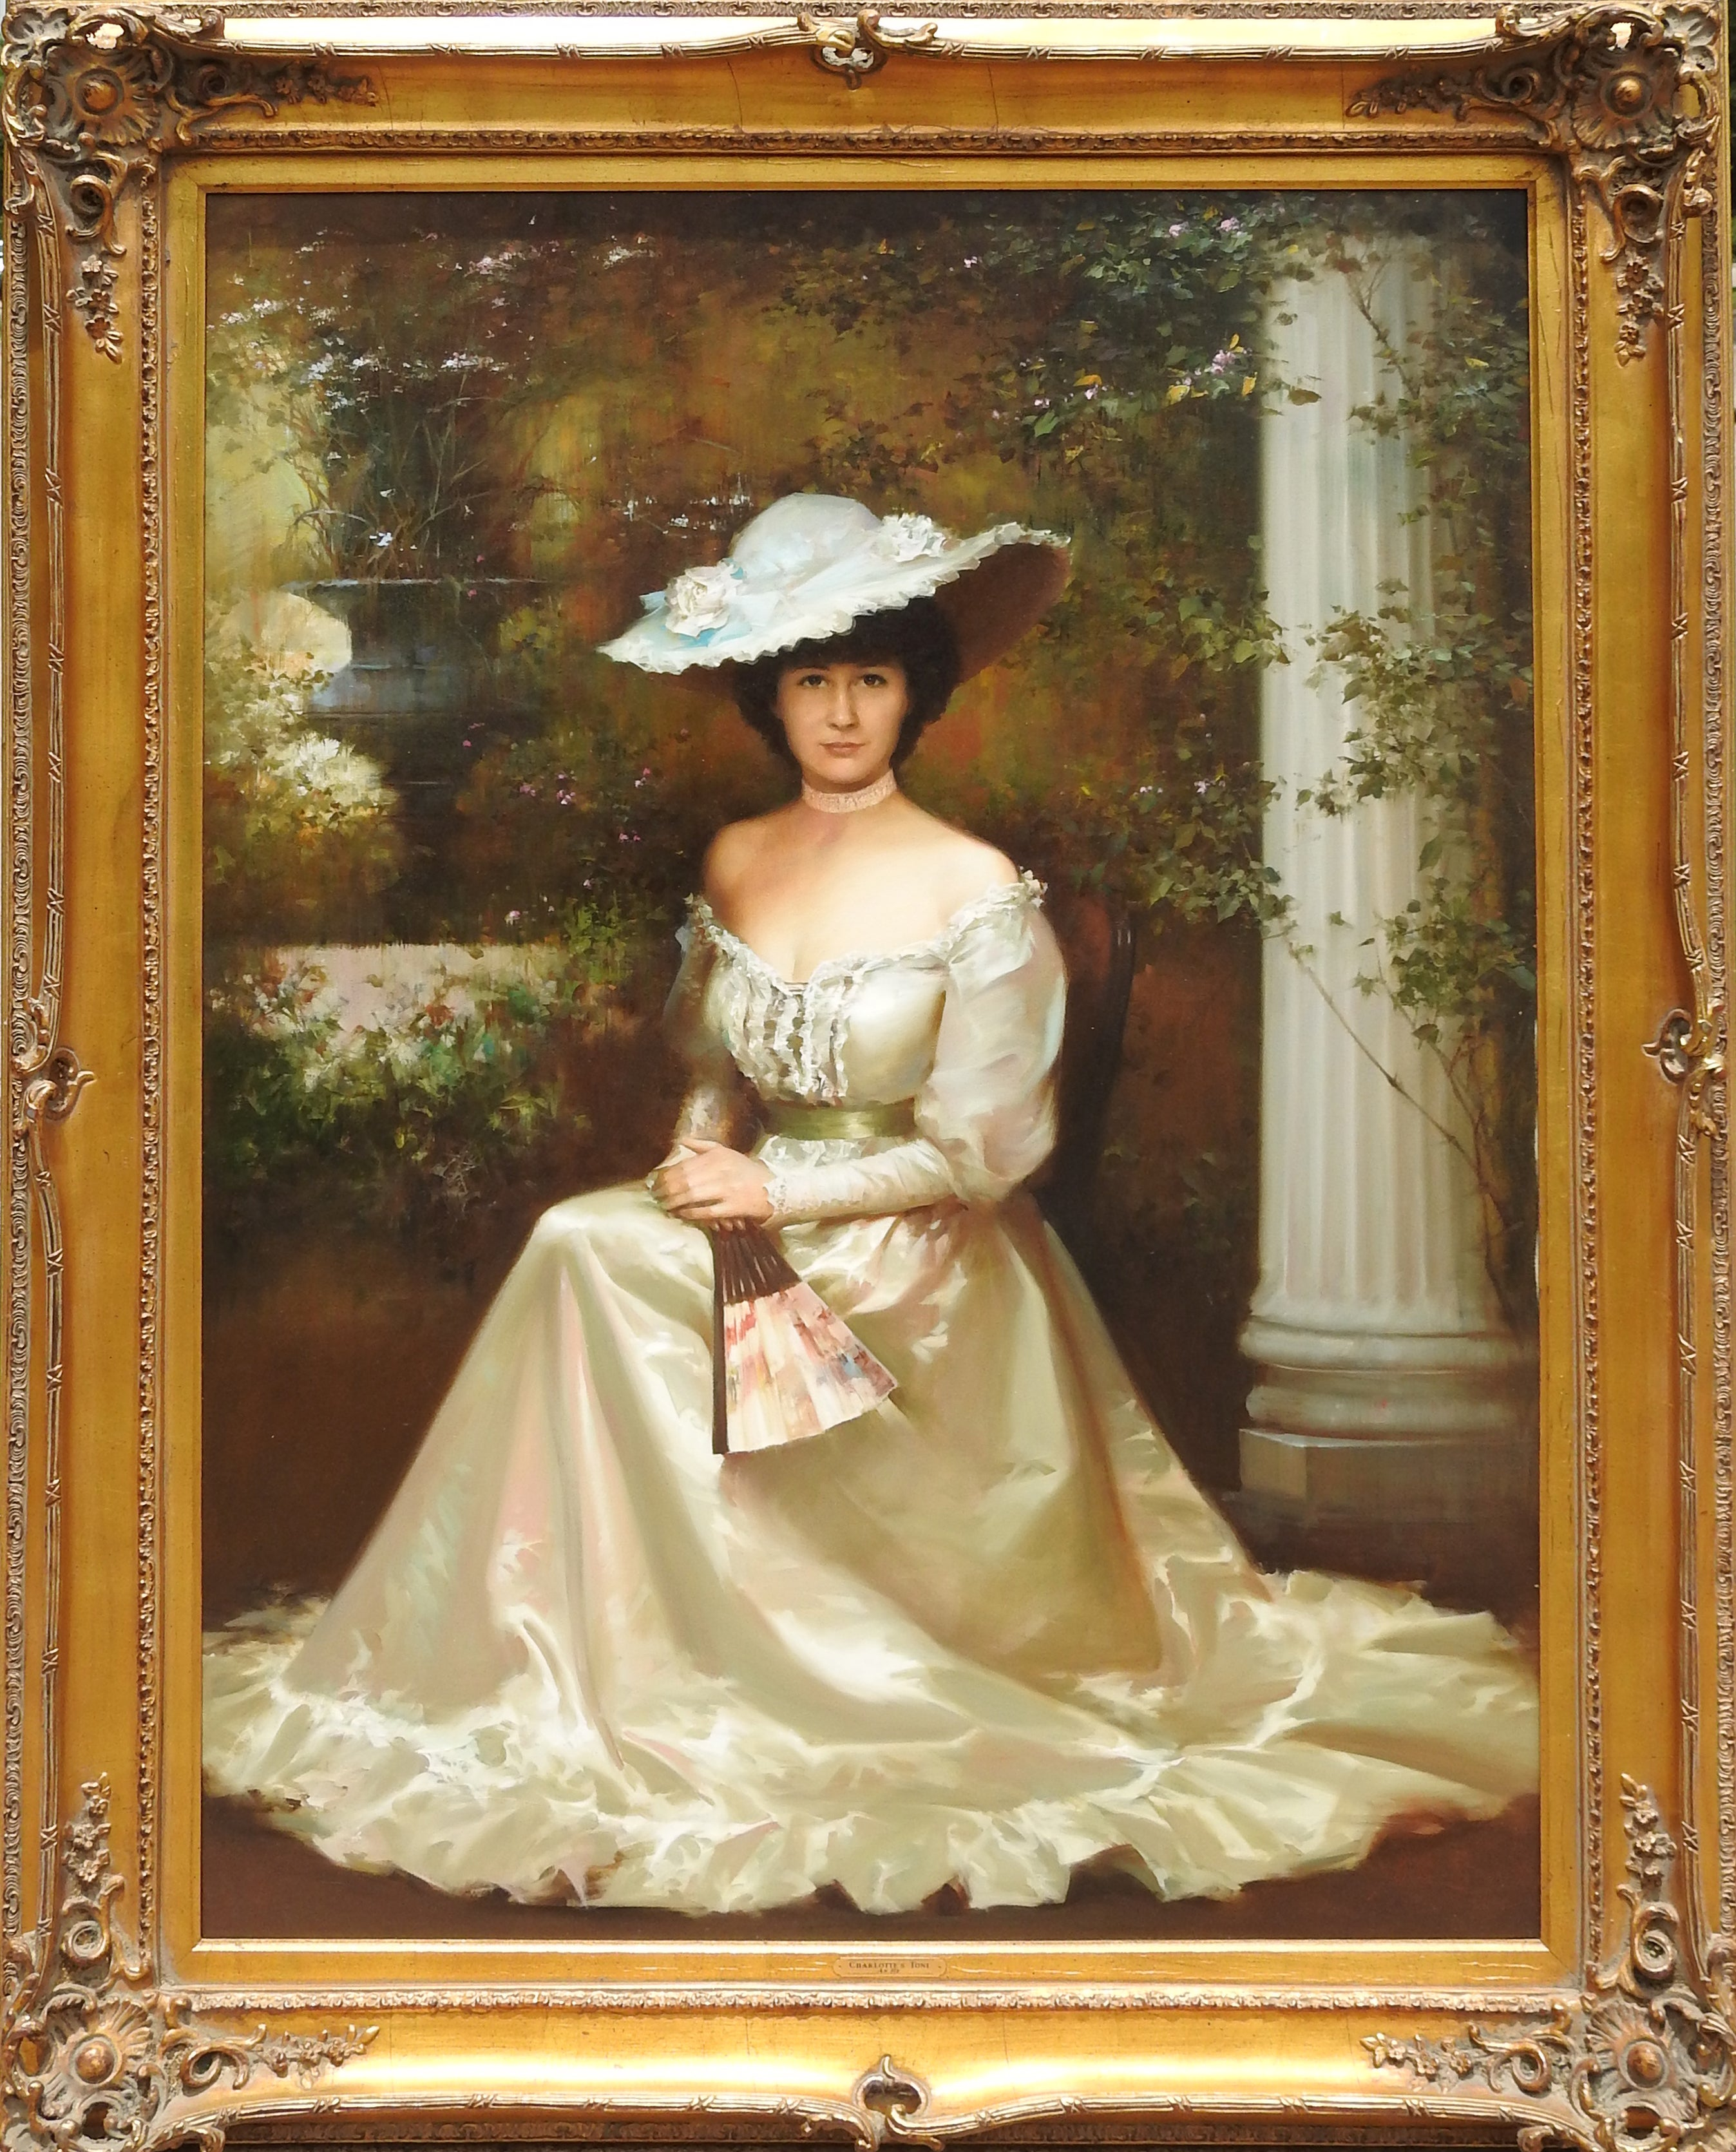 """Charlotte's Toni"", An He, Realistic Portrait, Original Oil on Canvas, 48x36 in."